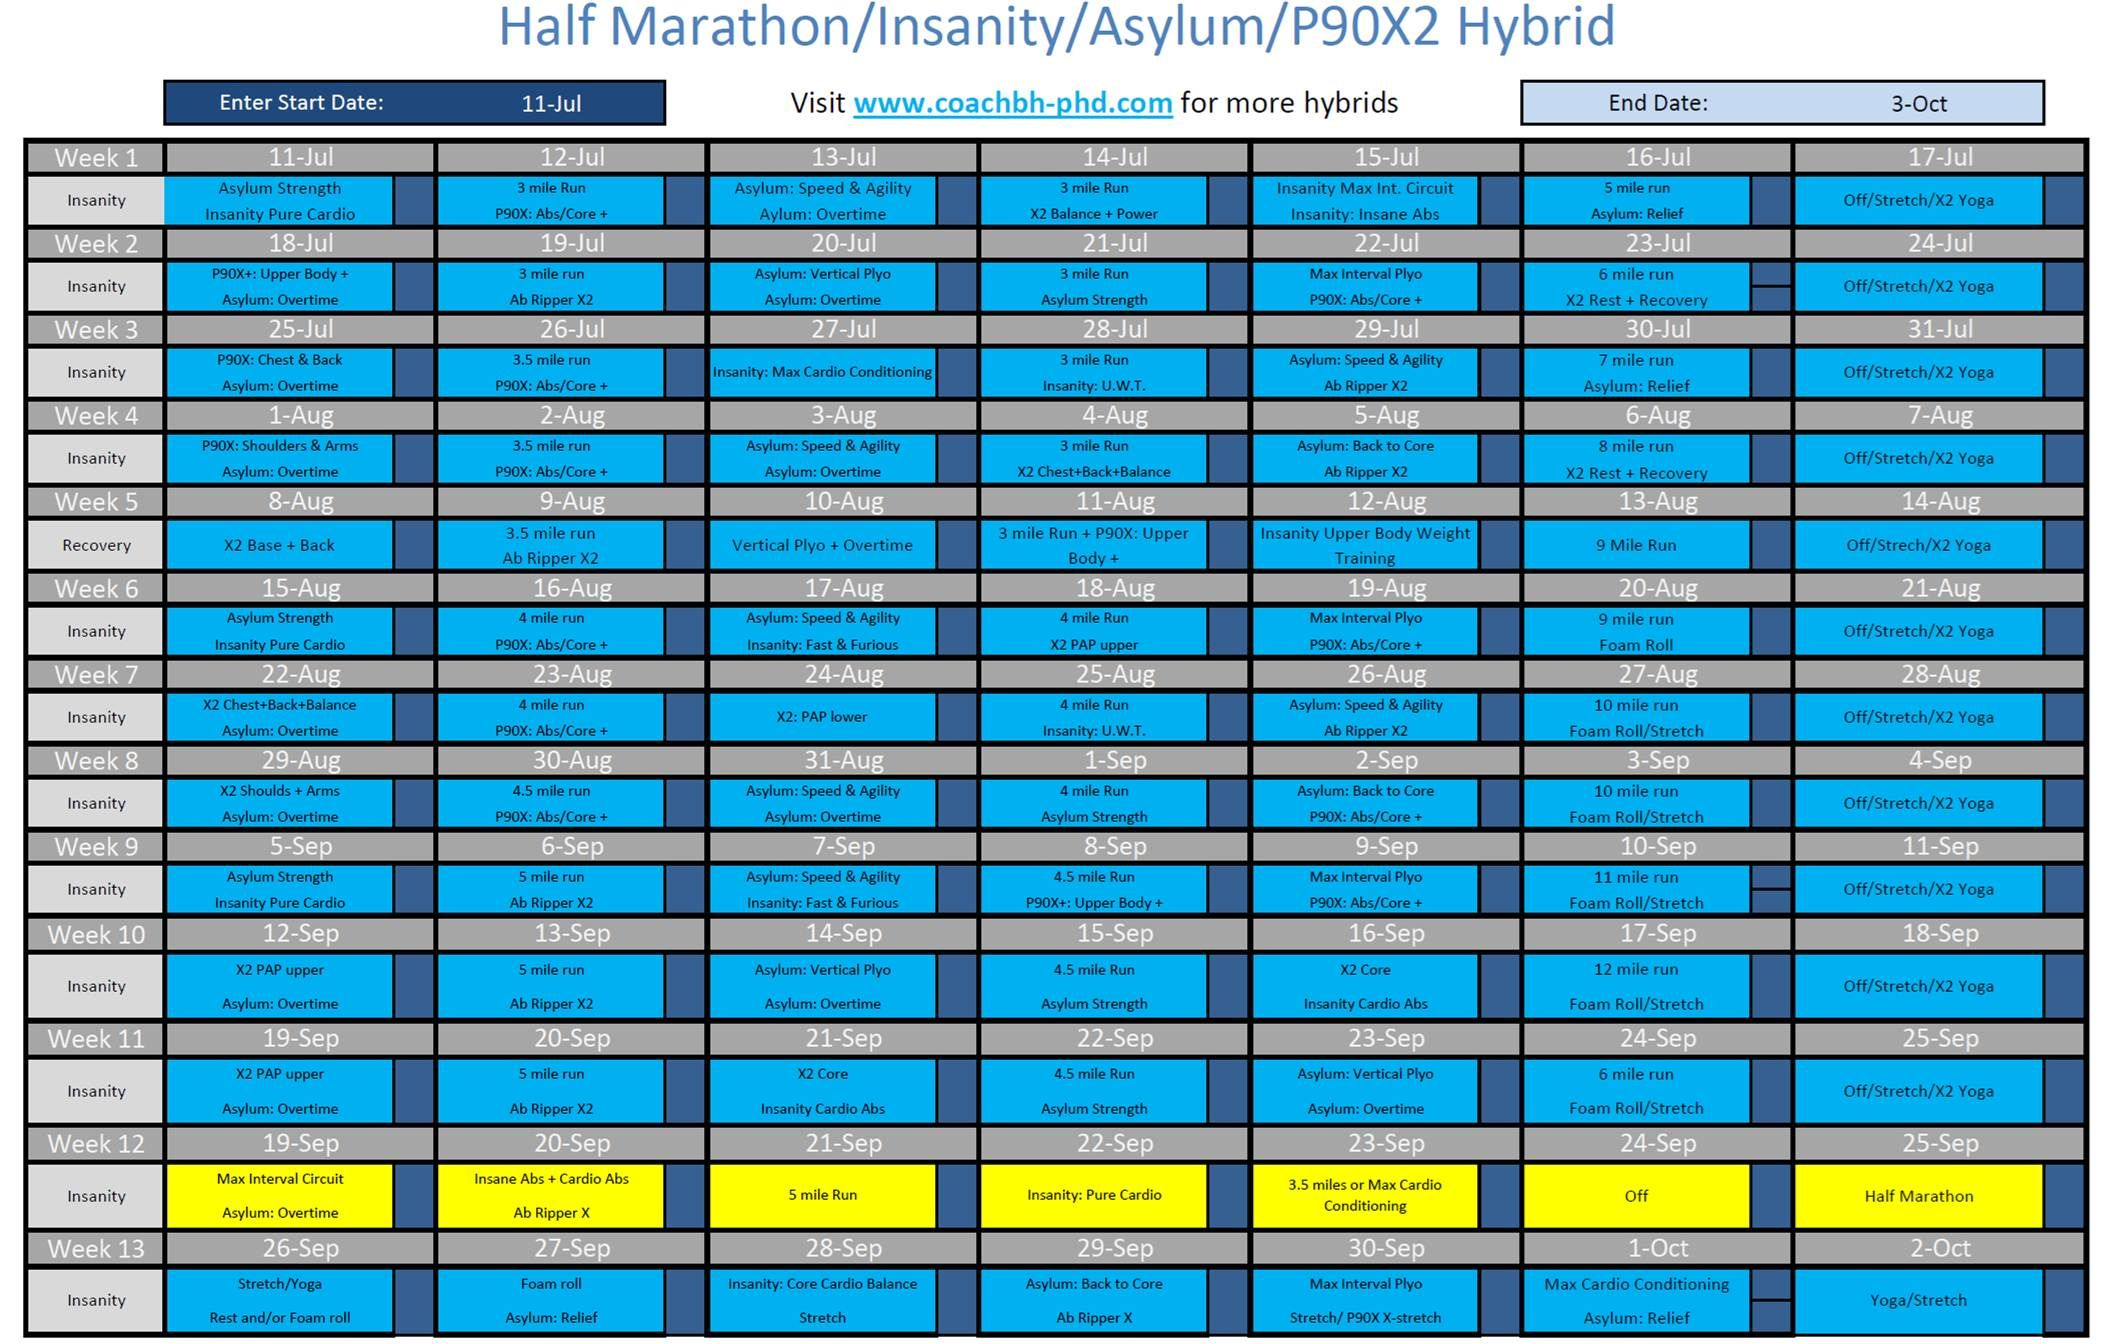 Insanity Hybrids - Monday Starts 12 Weeks To Poky Half